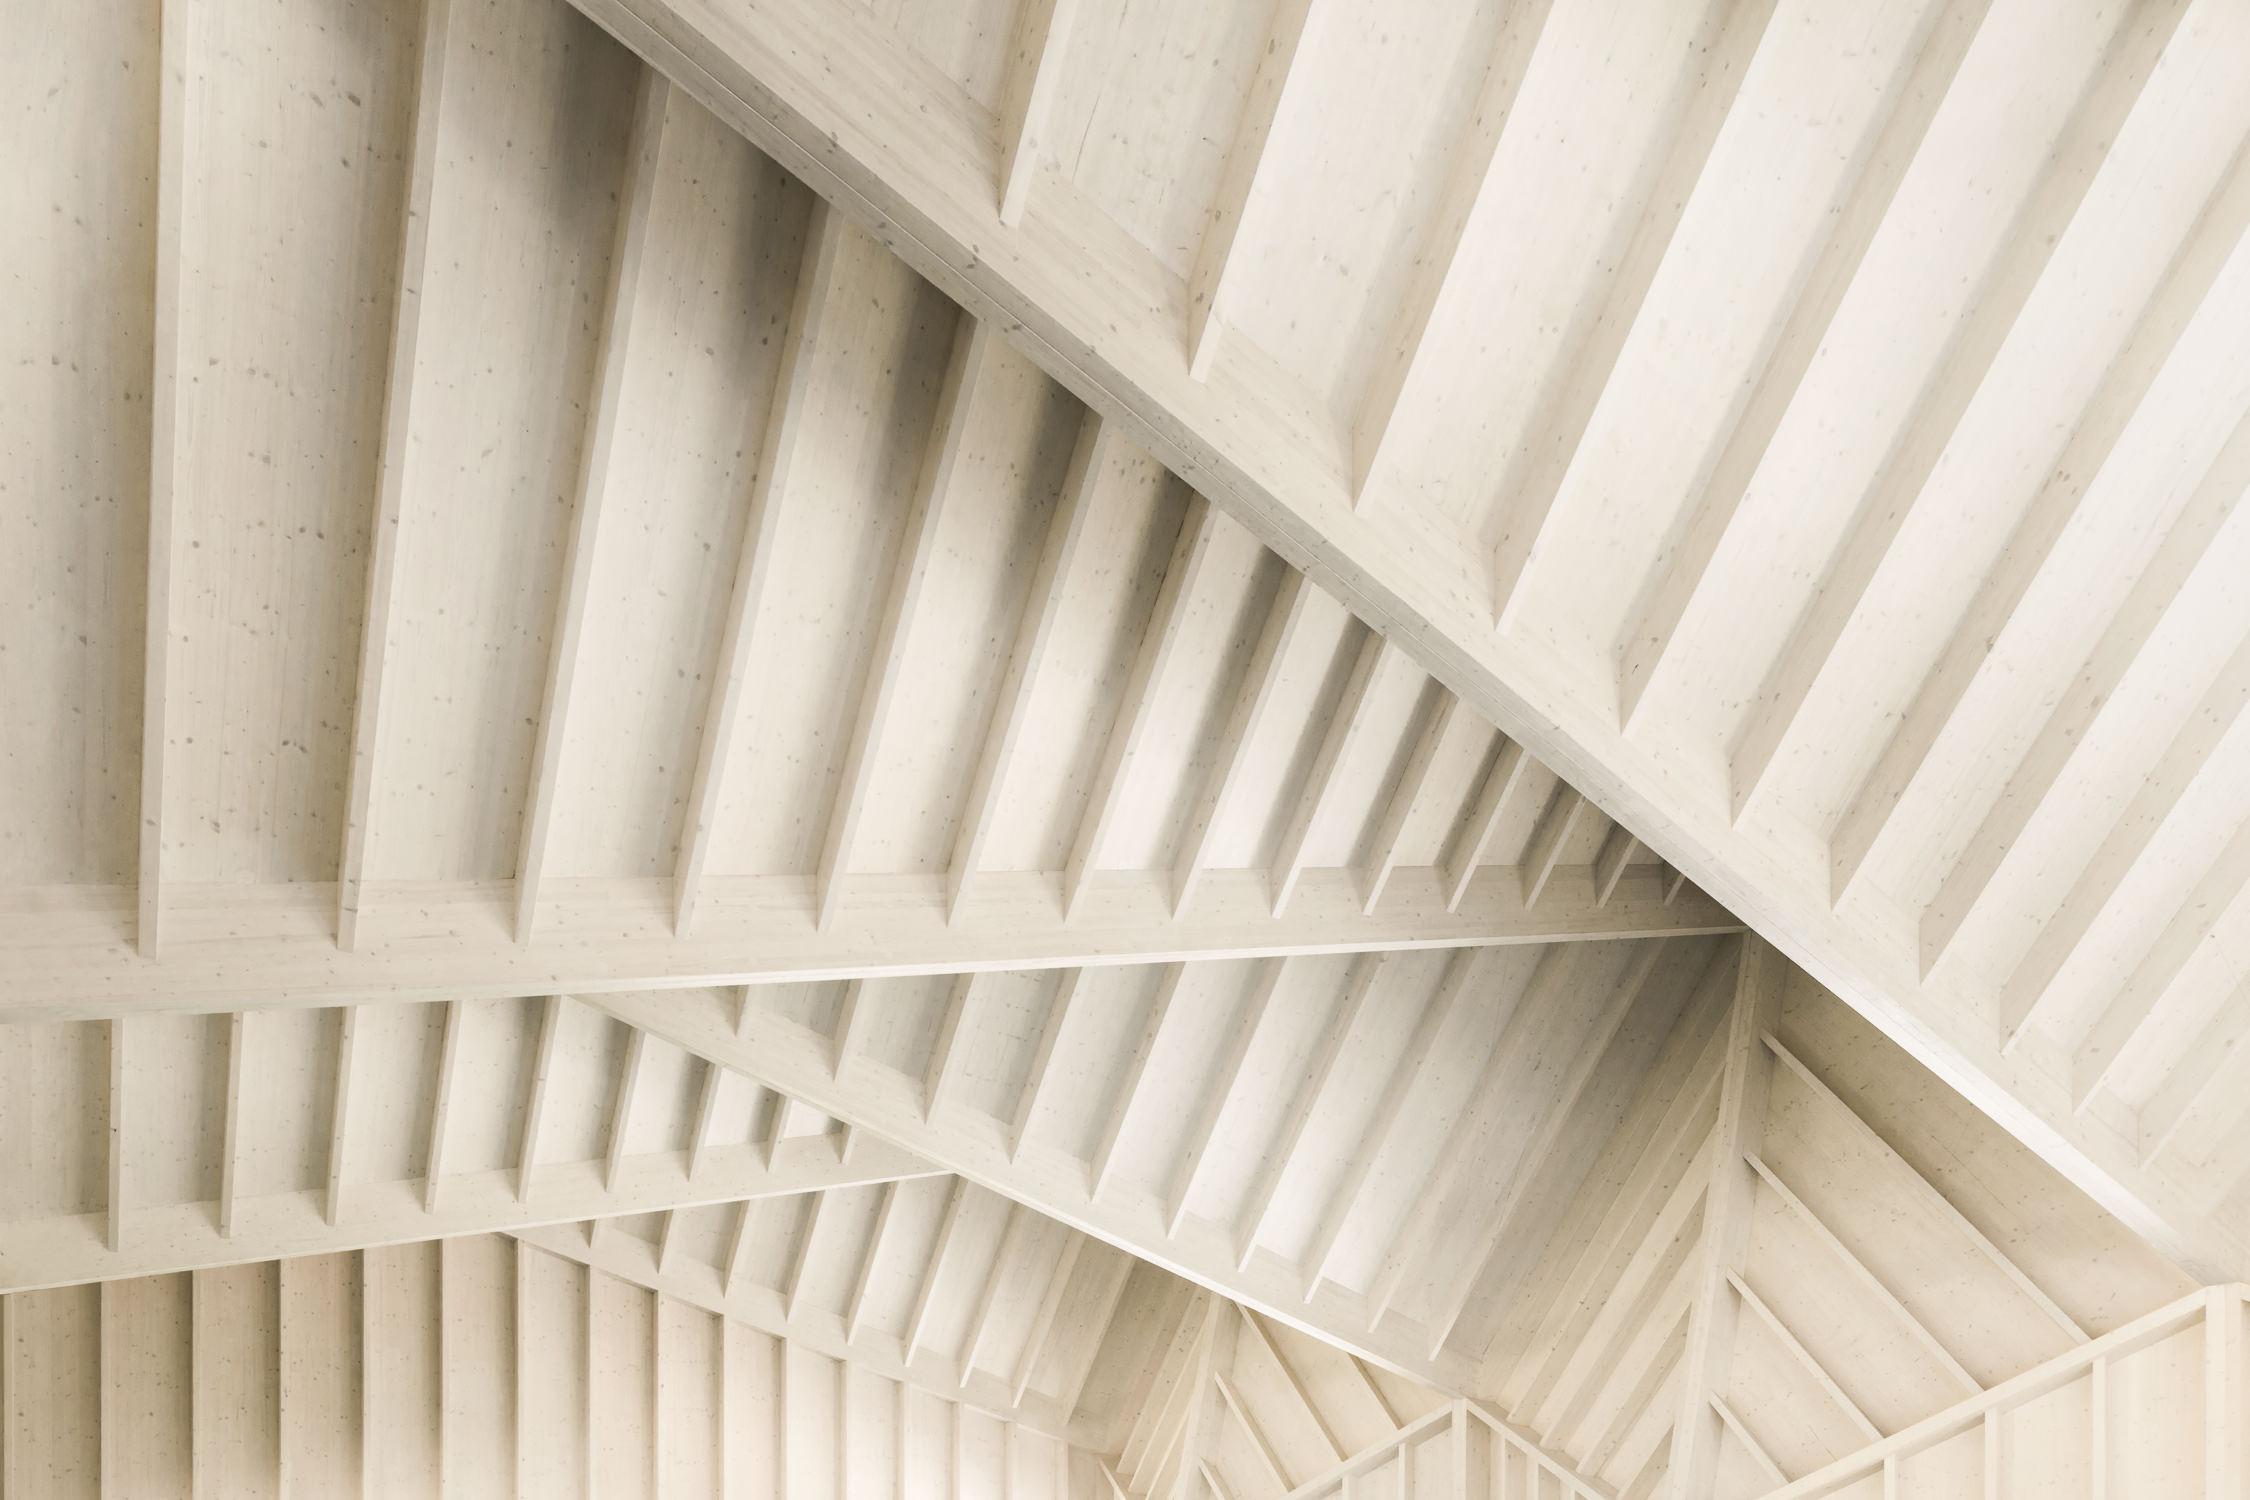 mark-hadden-architecture-photographer-architectuur-interieur-fotografie-london-amsterdam-dma-alfriston-119-Edit.jpg